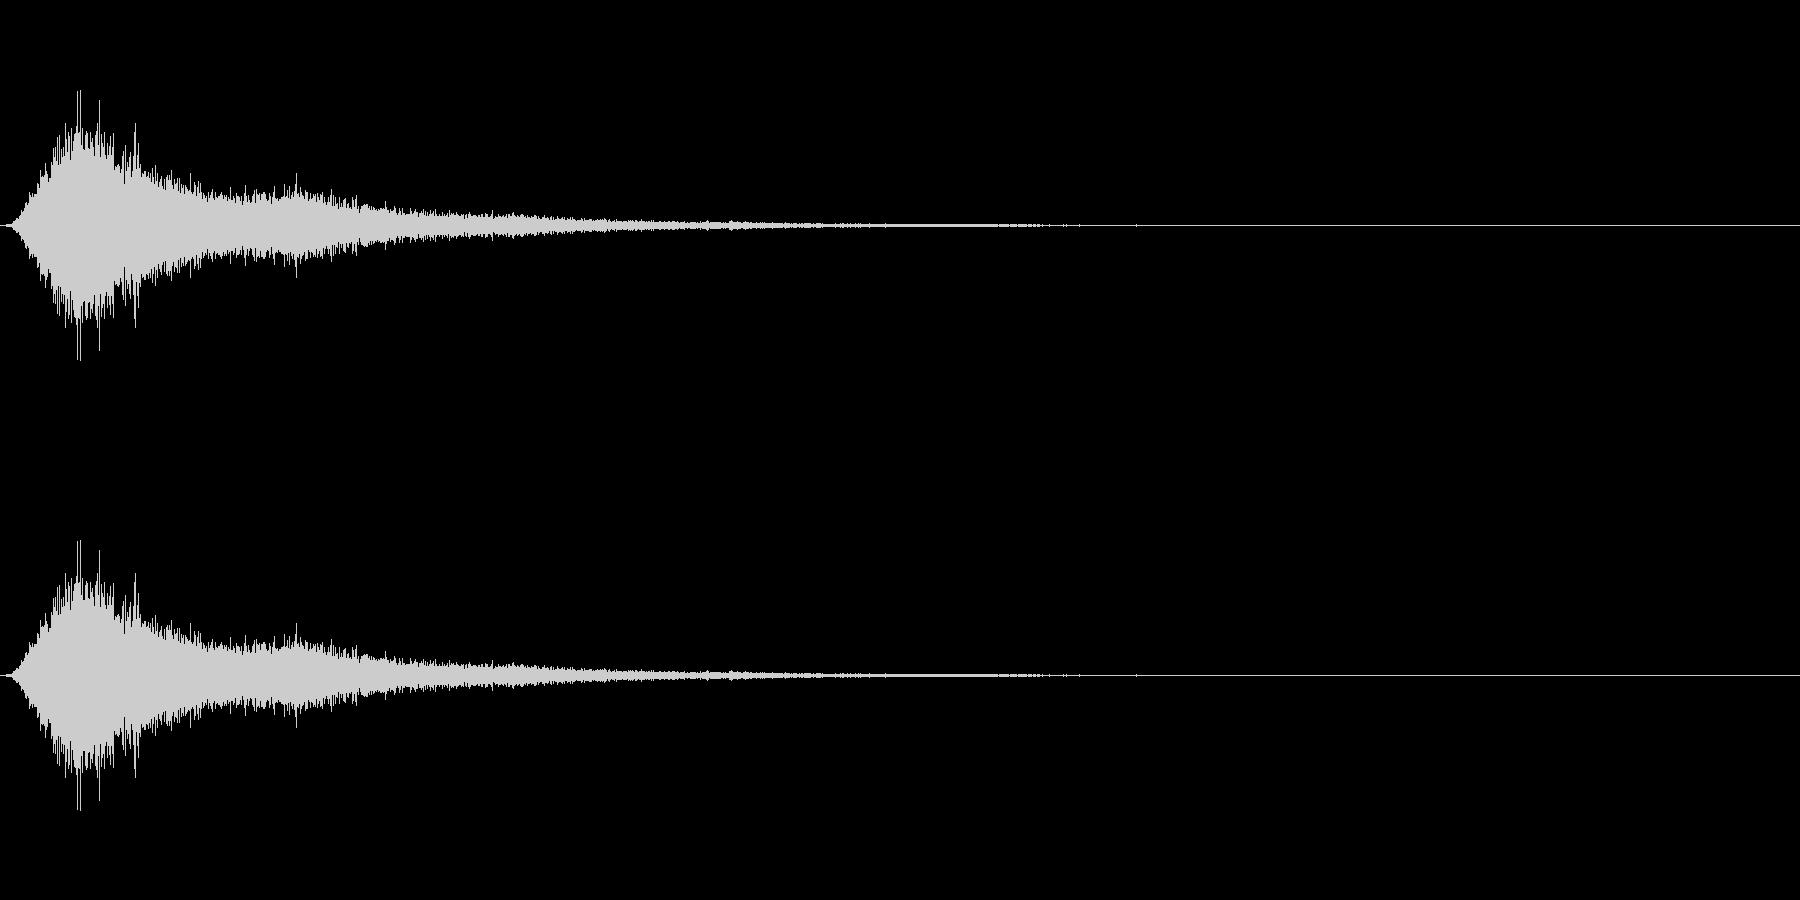 SF 移動音 9の未再生の波形